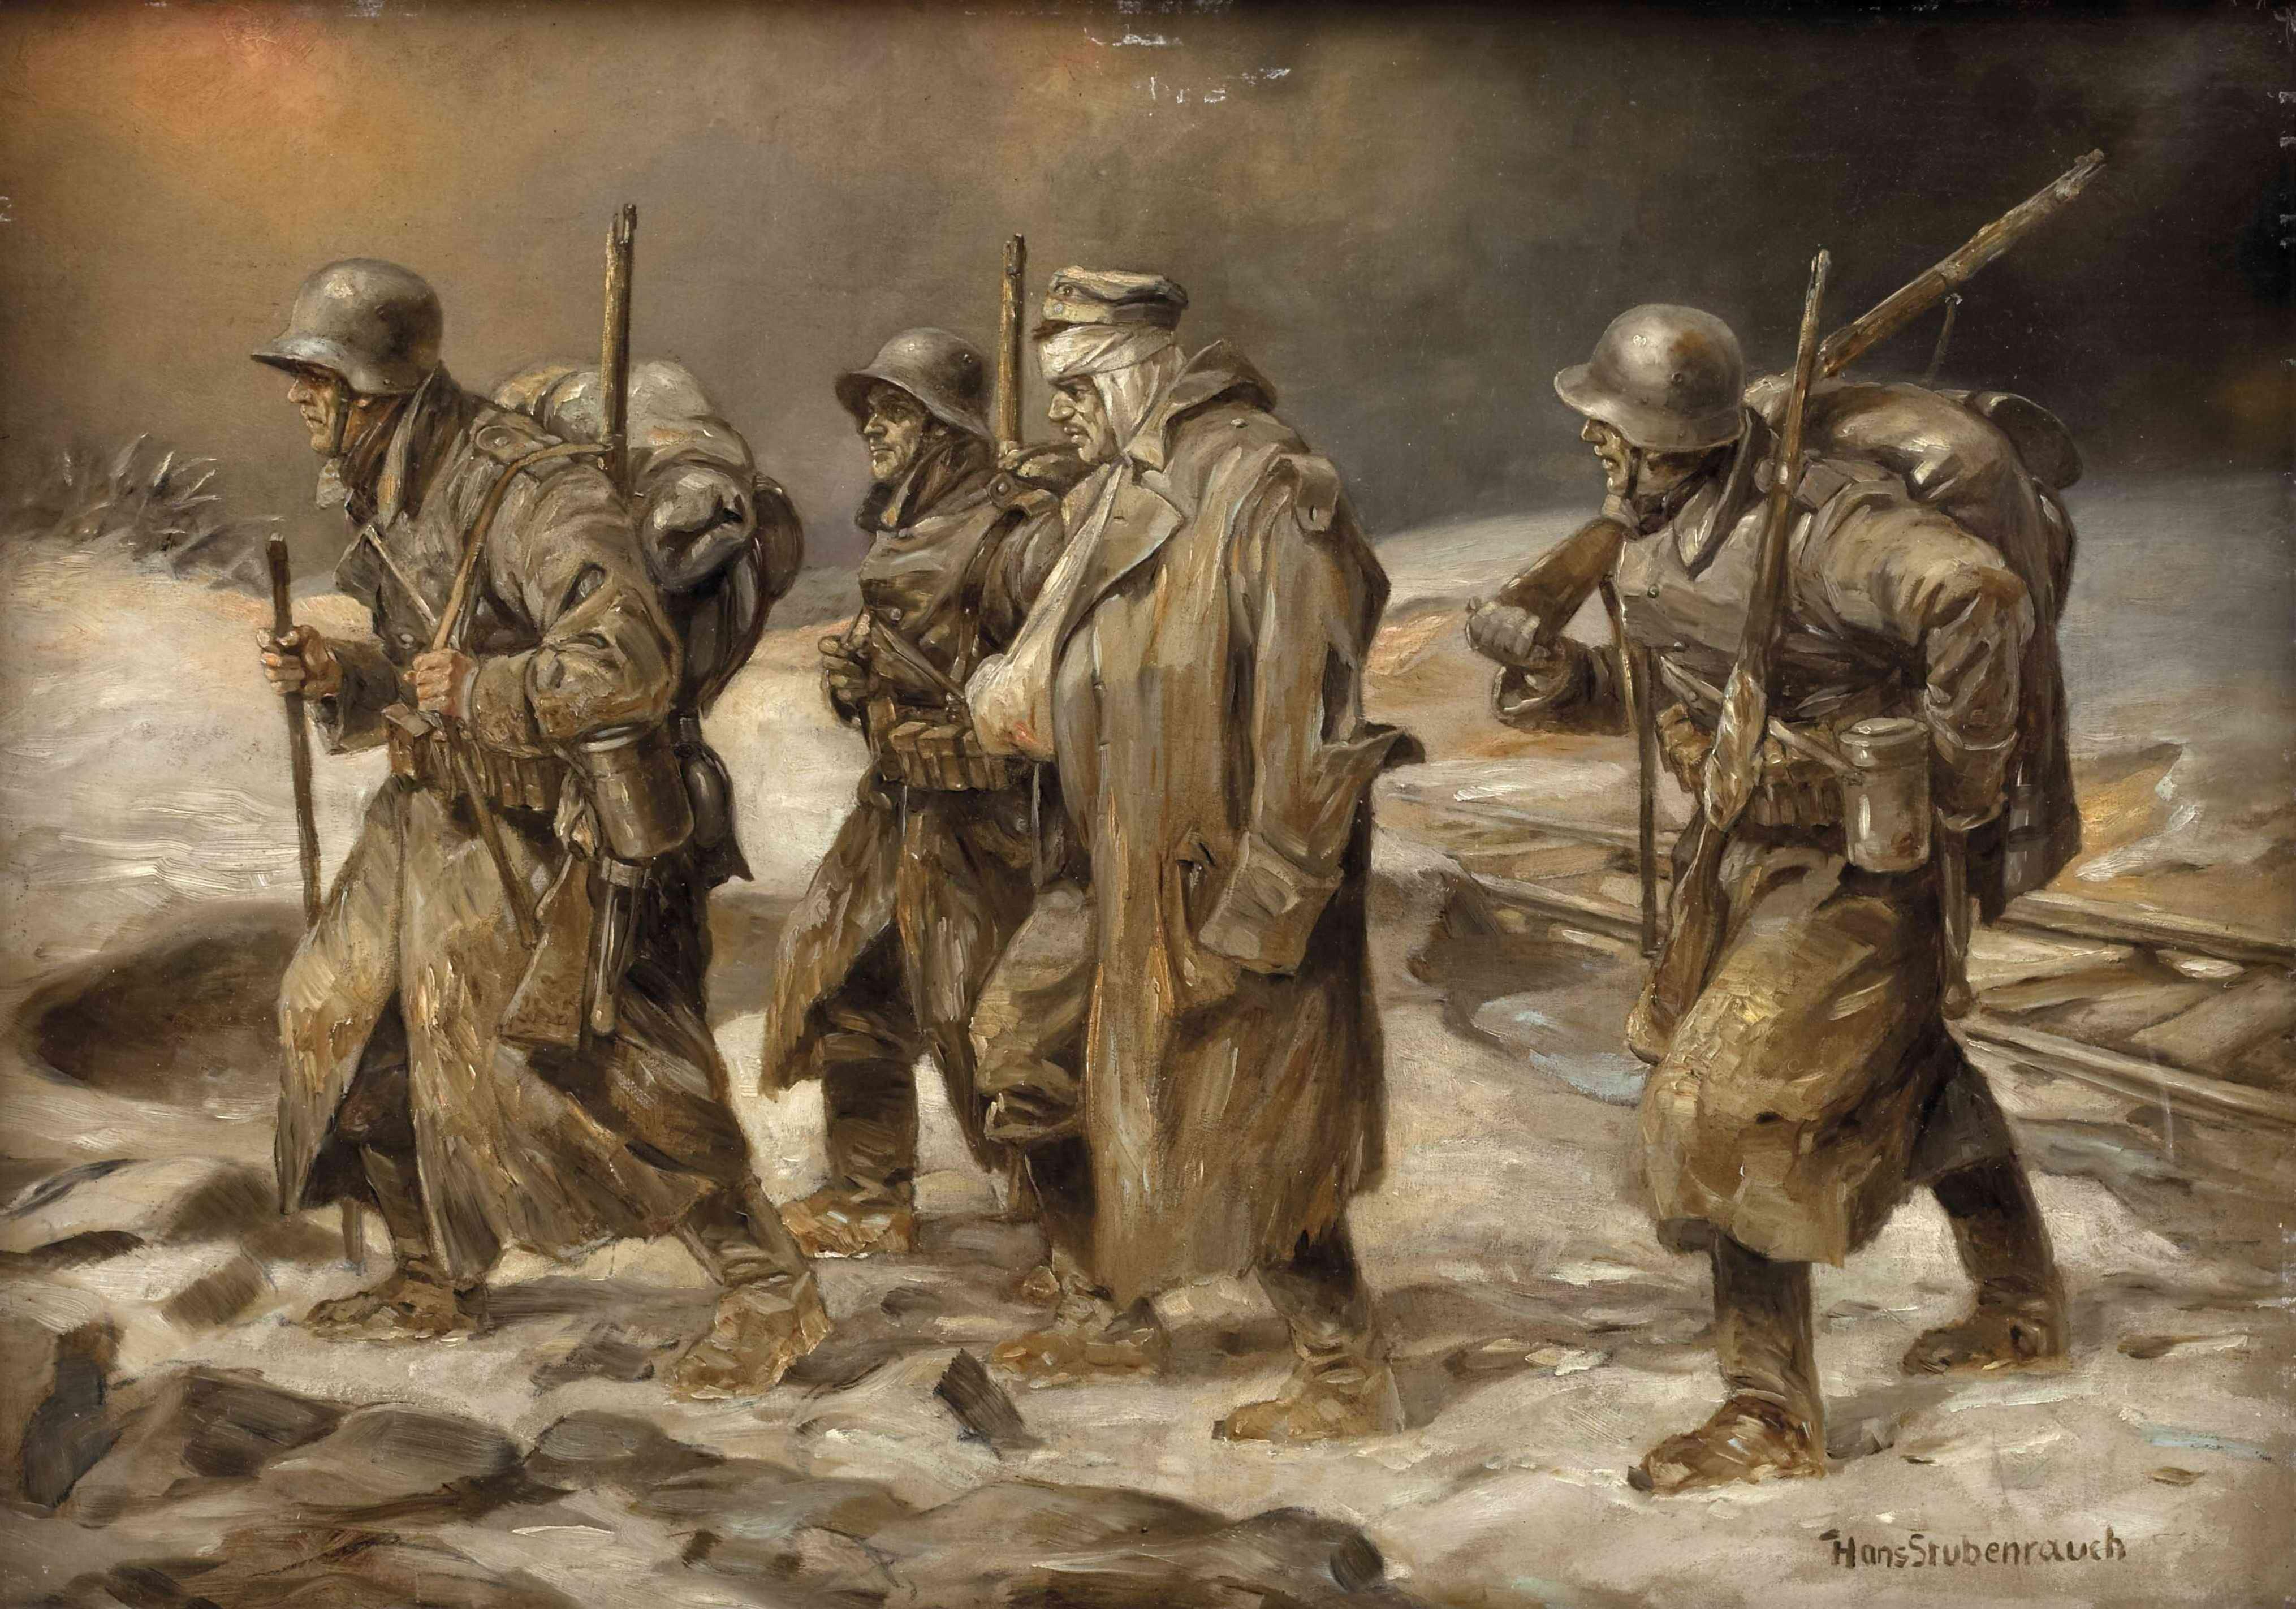 File:Stubenrauch Soldiers.jpg - Wikimedia Commons